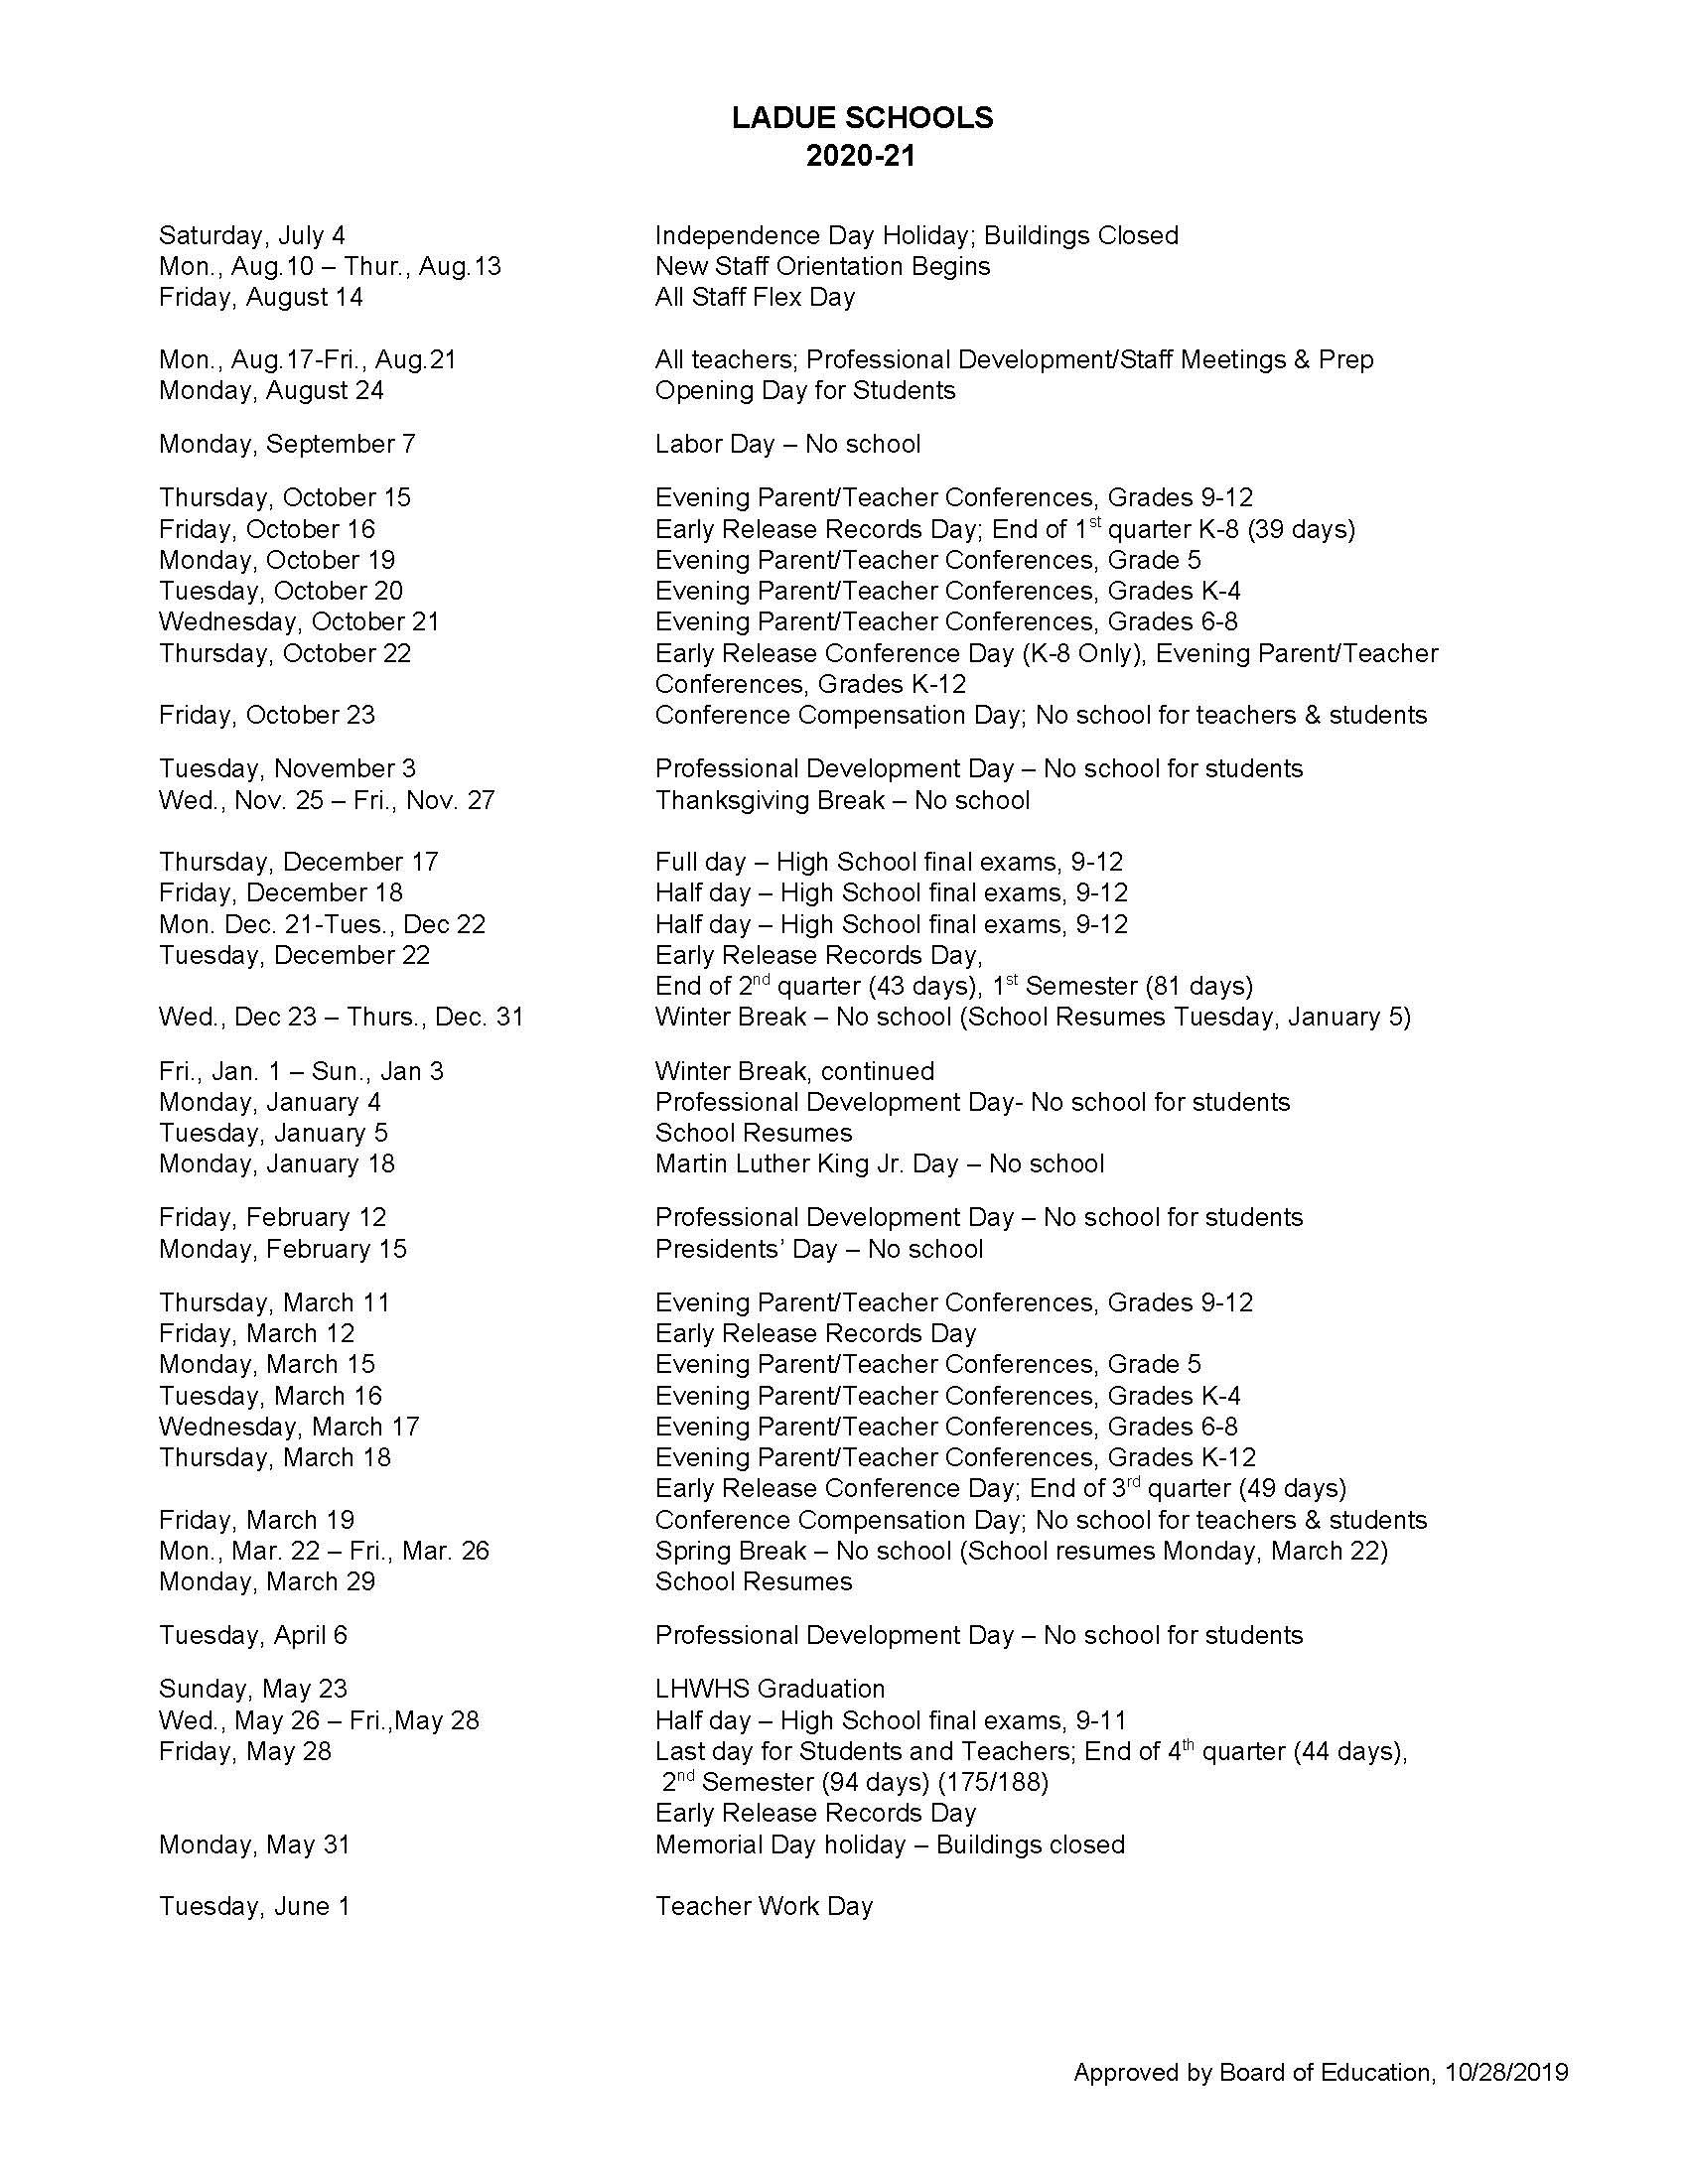 Ladue-2020-2021-school-calendar-notes